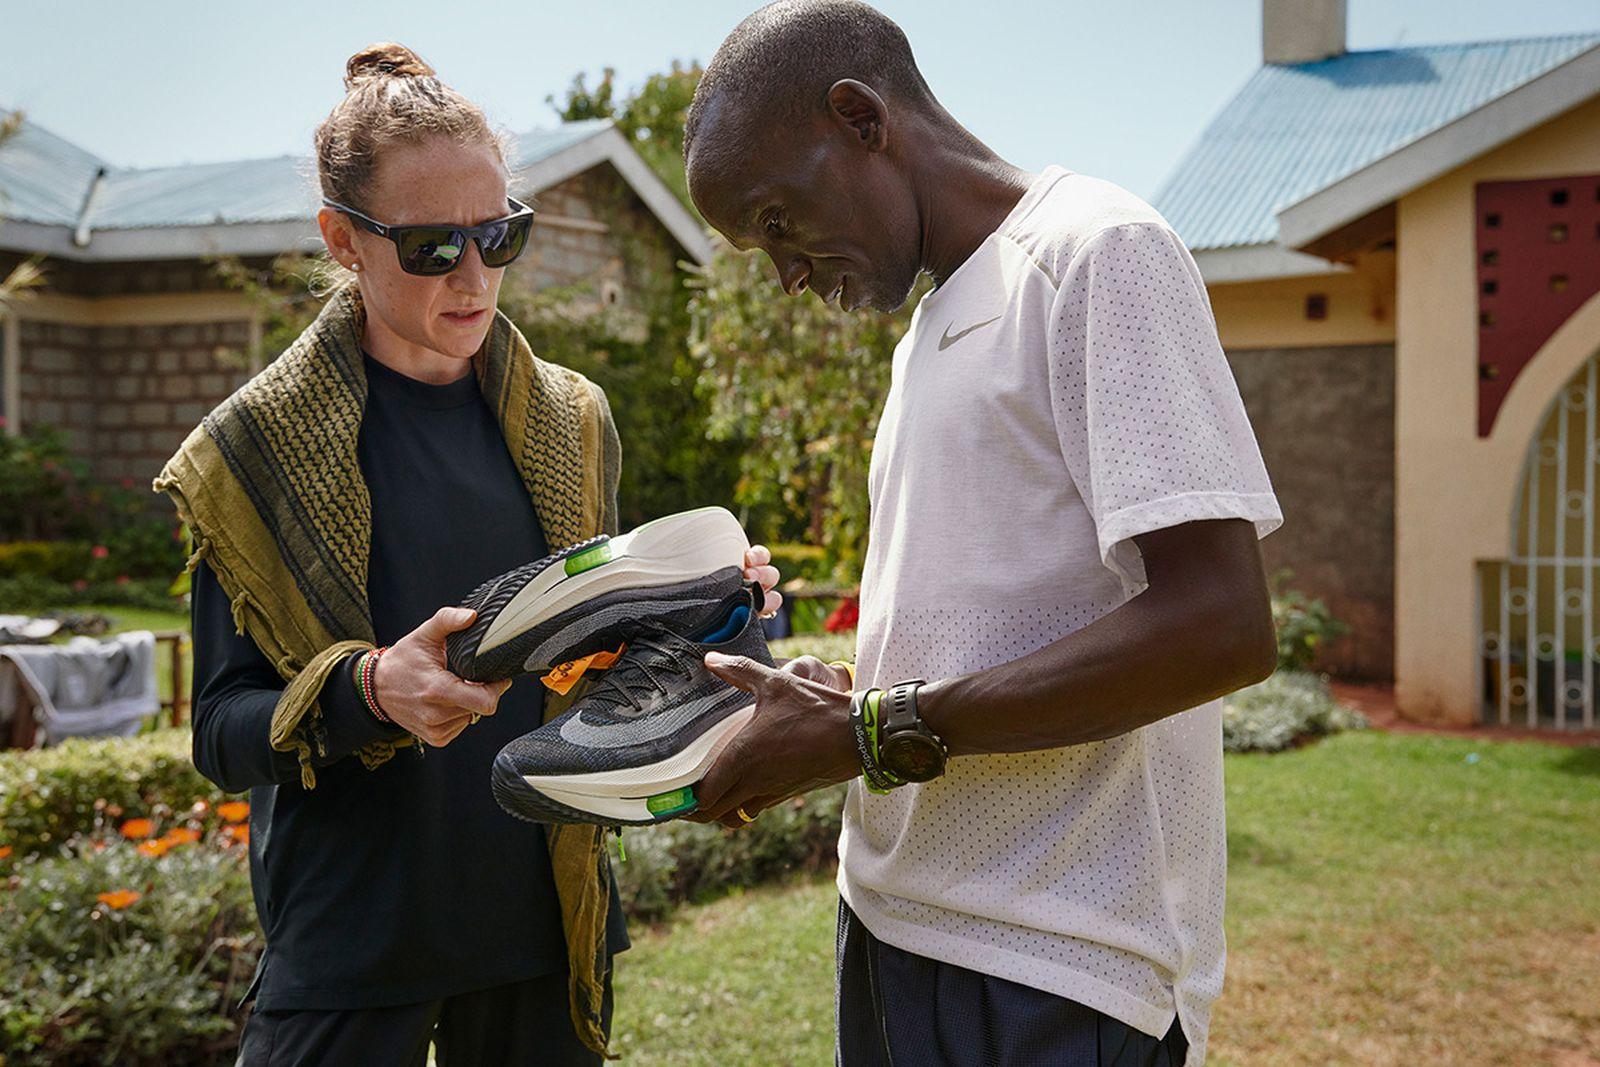 eliud-kipchoge-nike-air-zoom-alphafly-kenya-interview-08